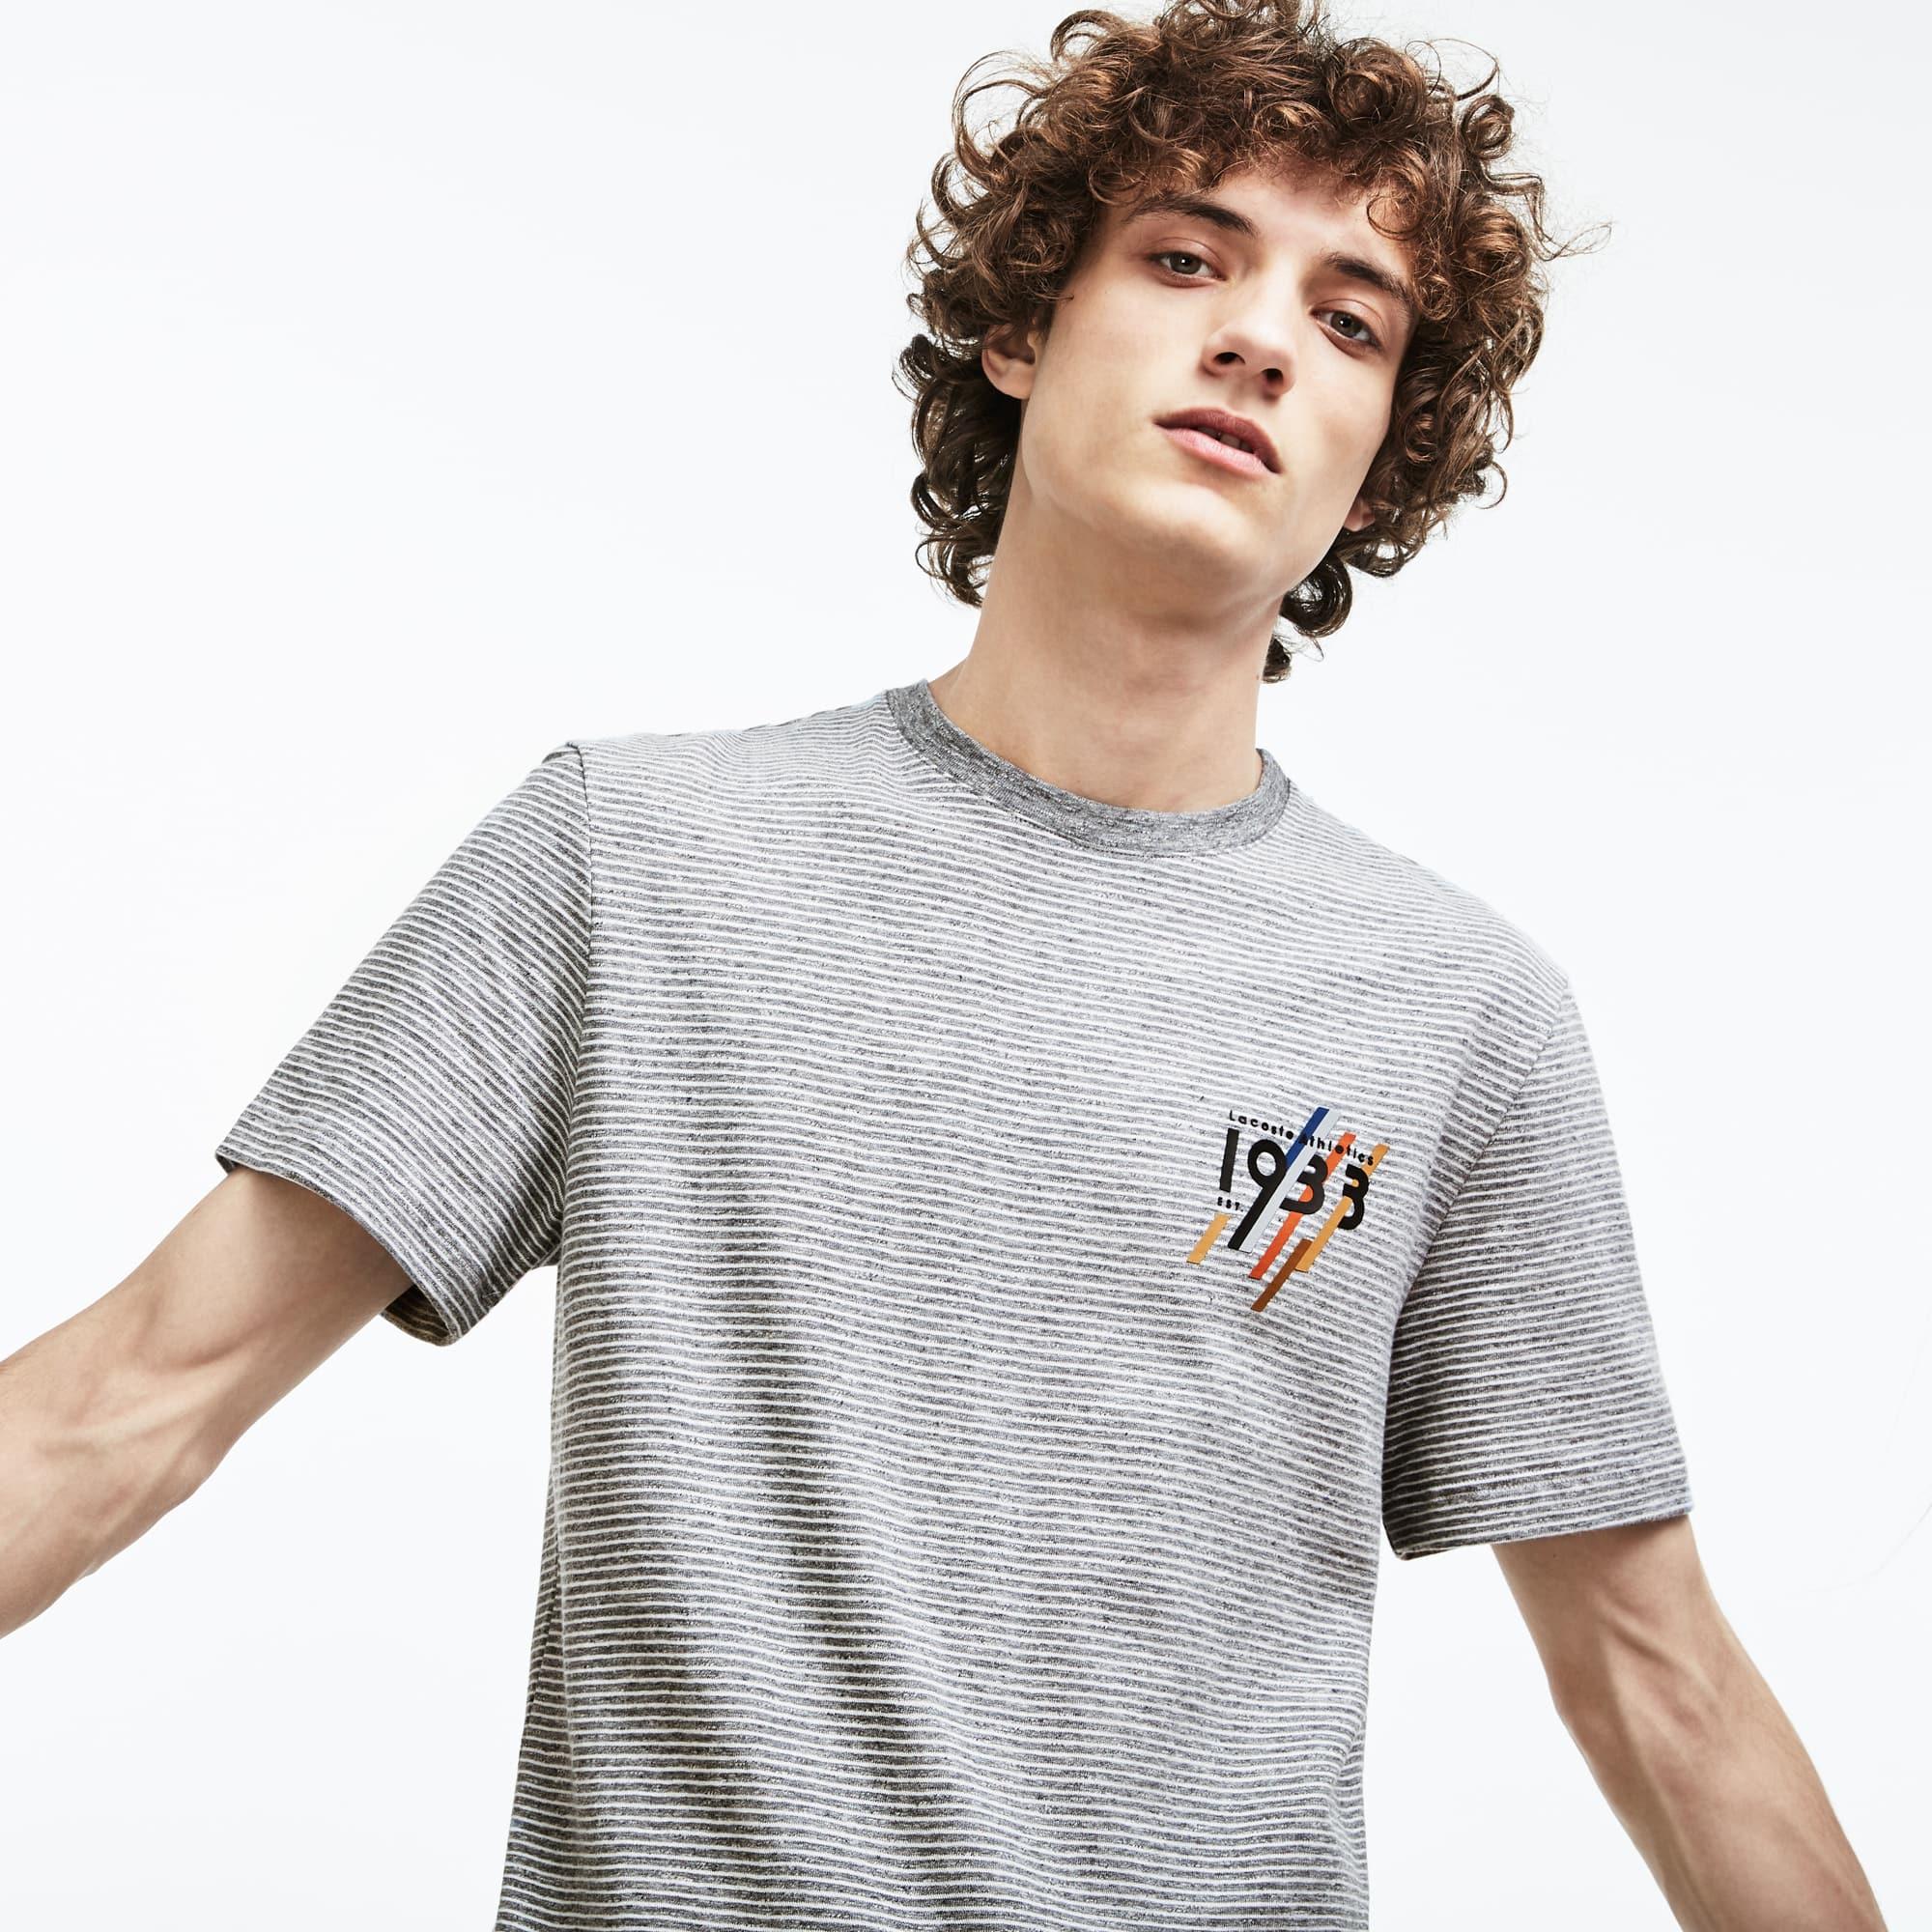 Men's Crew Neck 1933 Lettering Striped Cotton Jersey T-shirt